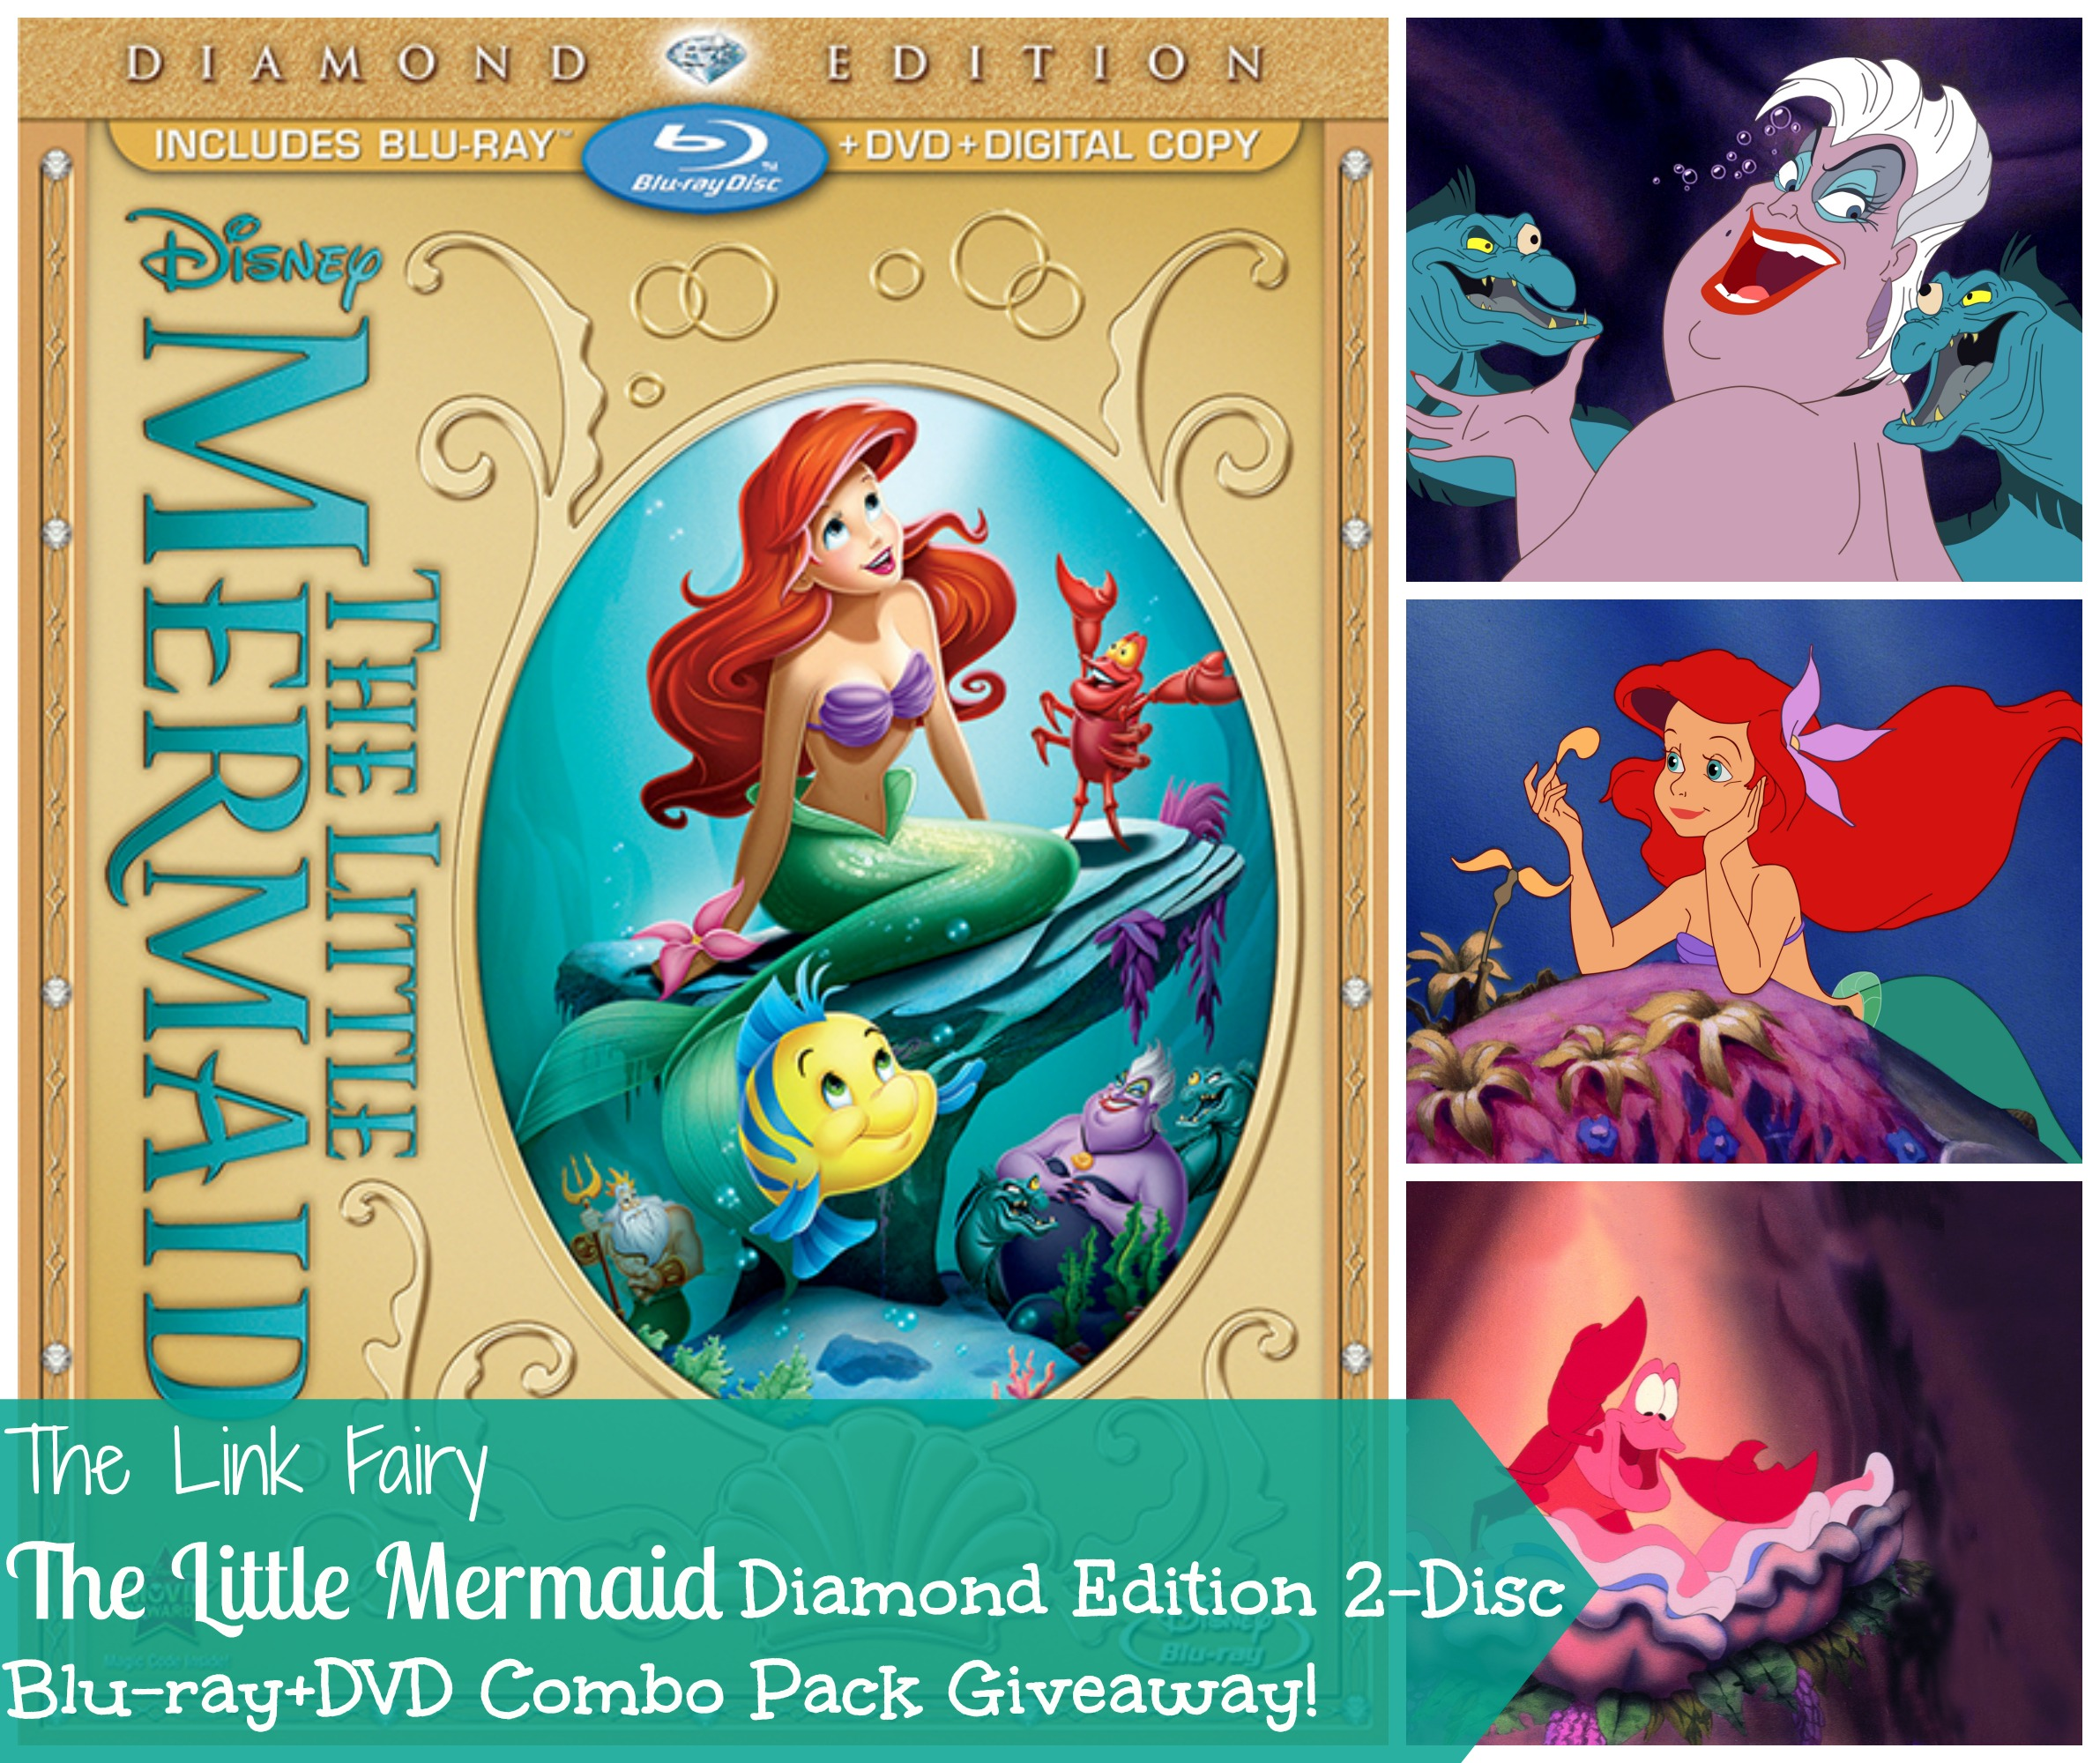 Edition Diamond: The Little Mermaid Diamond Edition Blu-Ray Combo Pack Giveaway